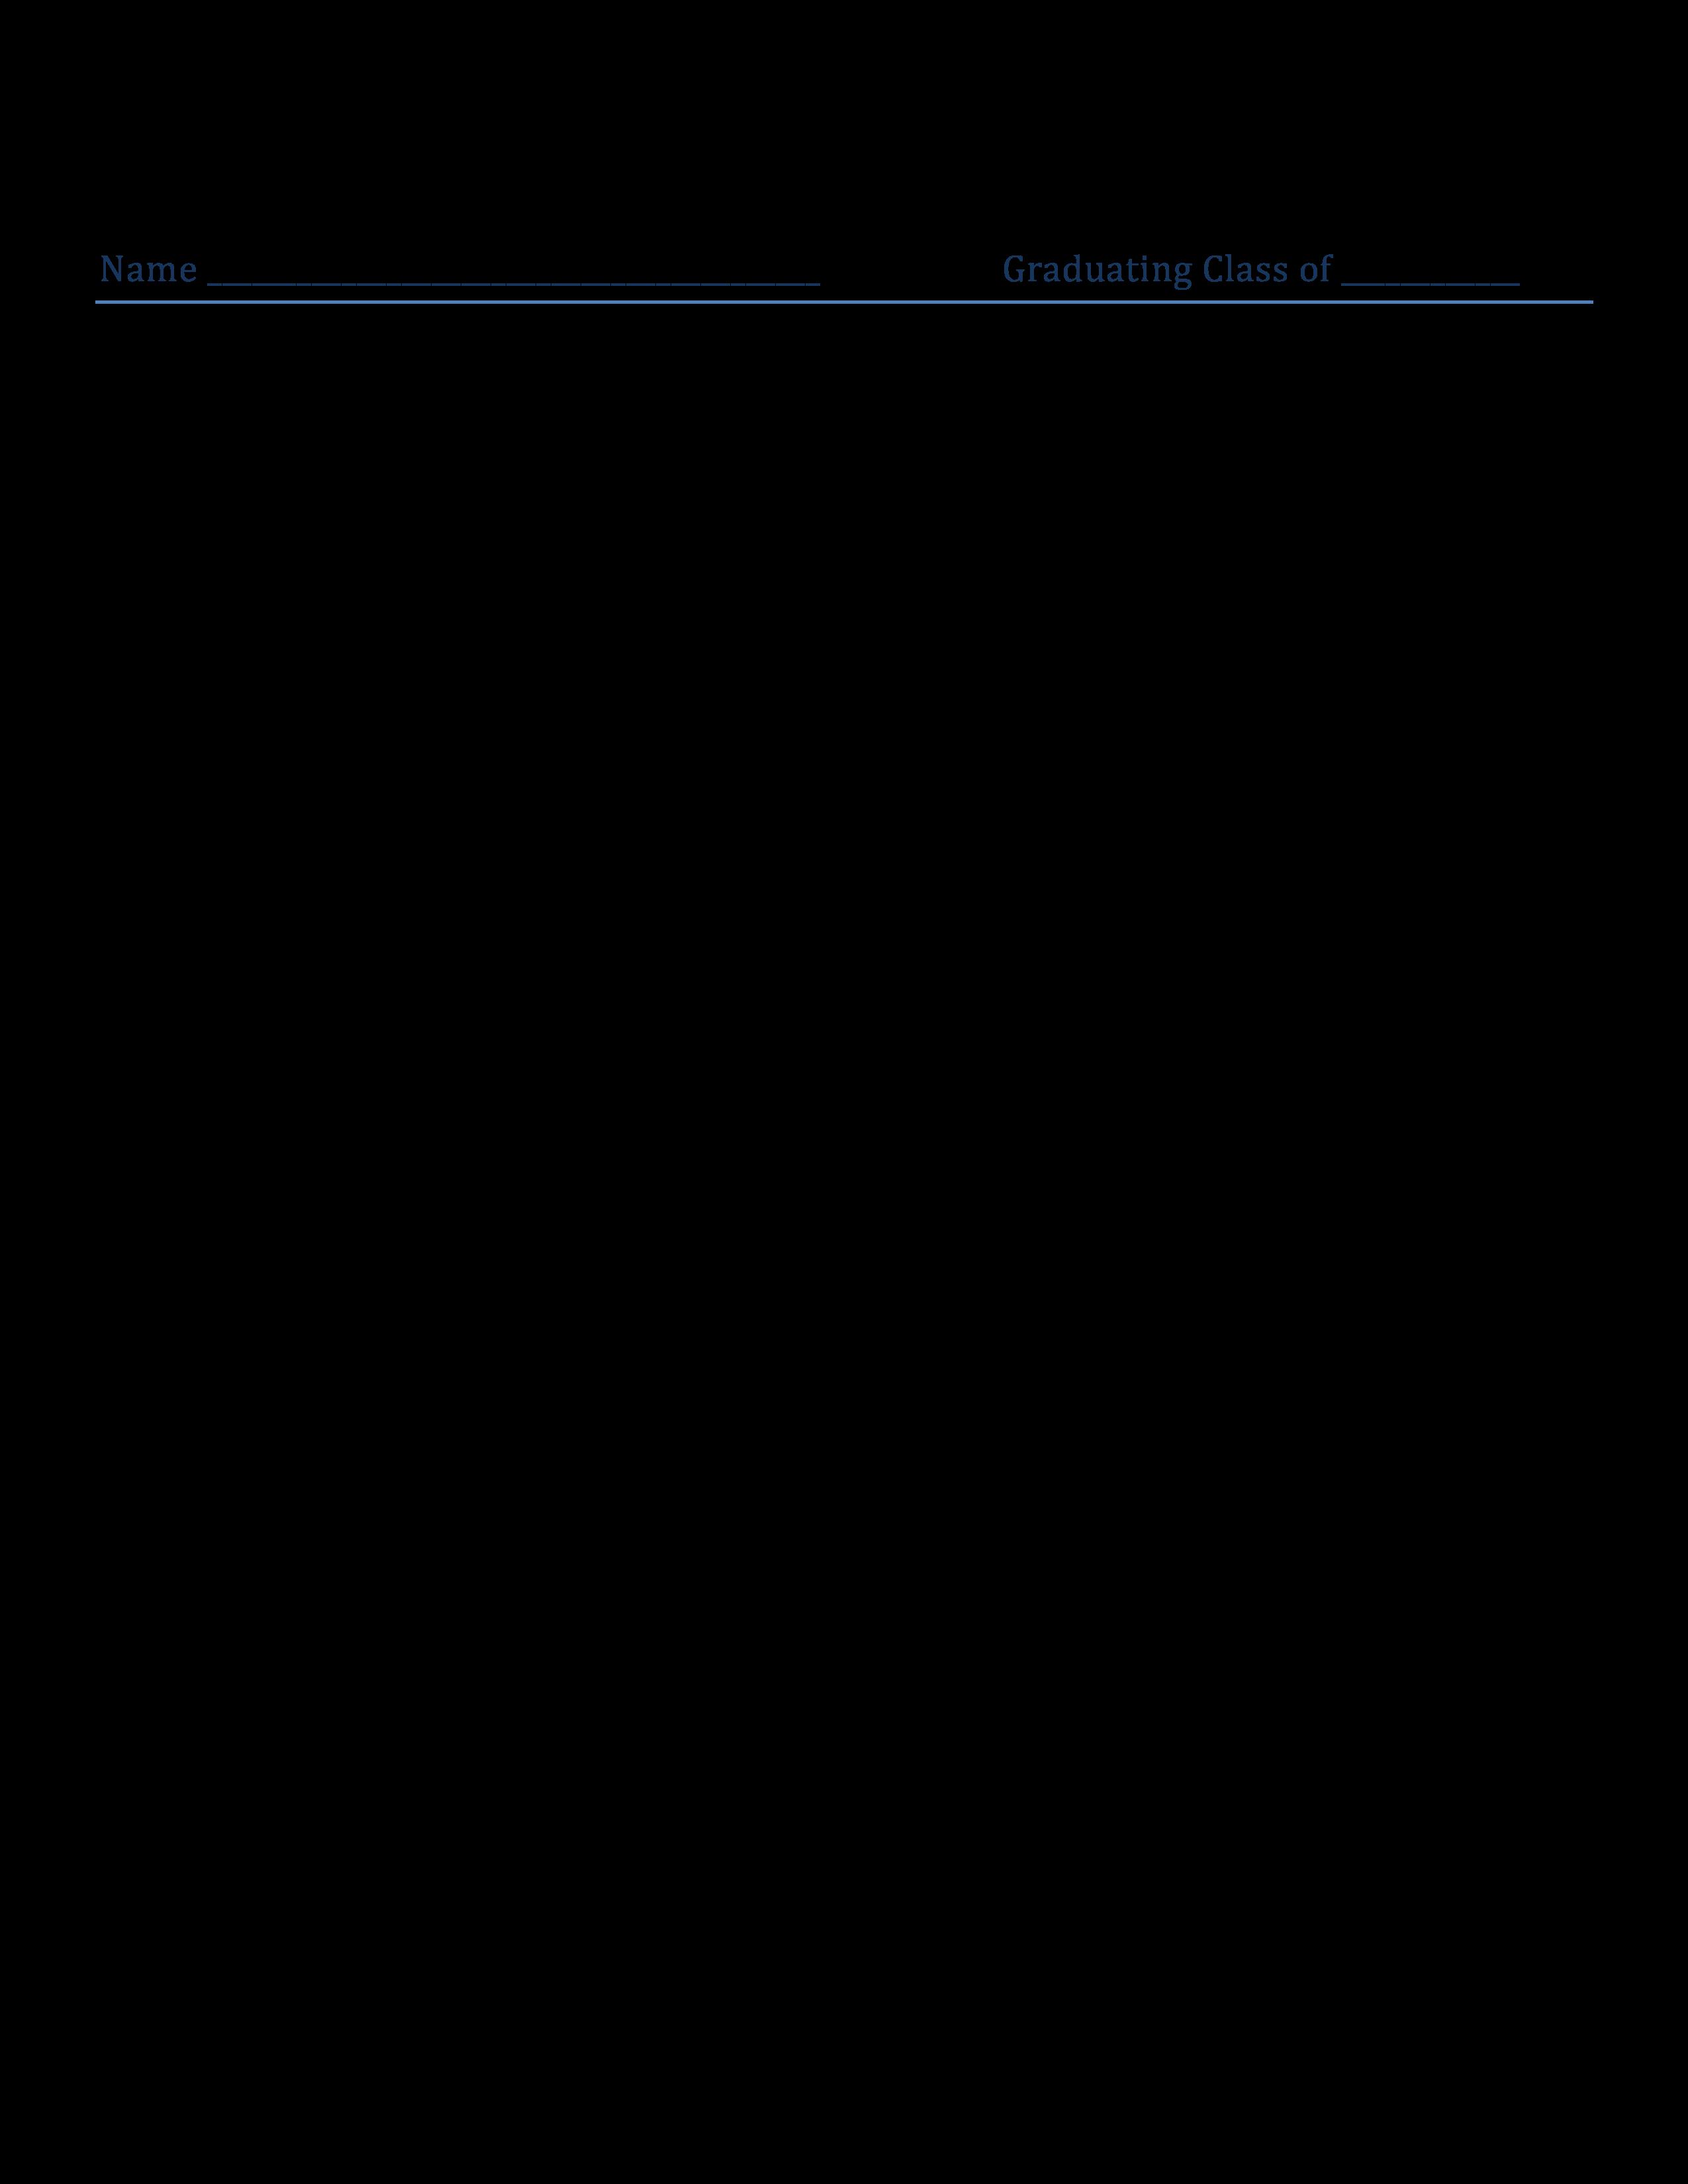 Profile Sheet Main Image Template